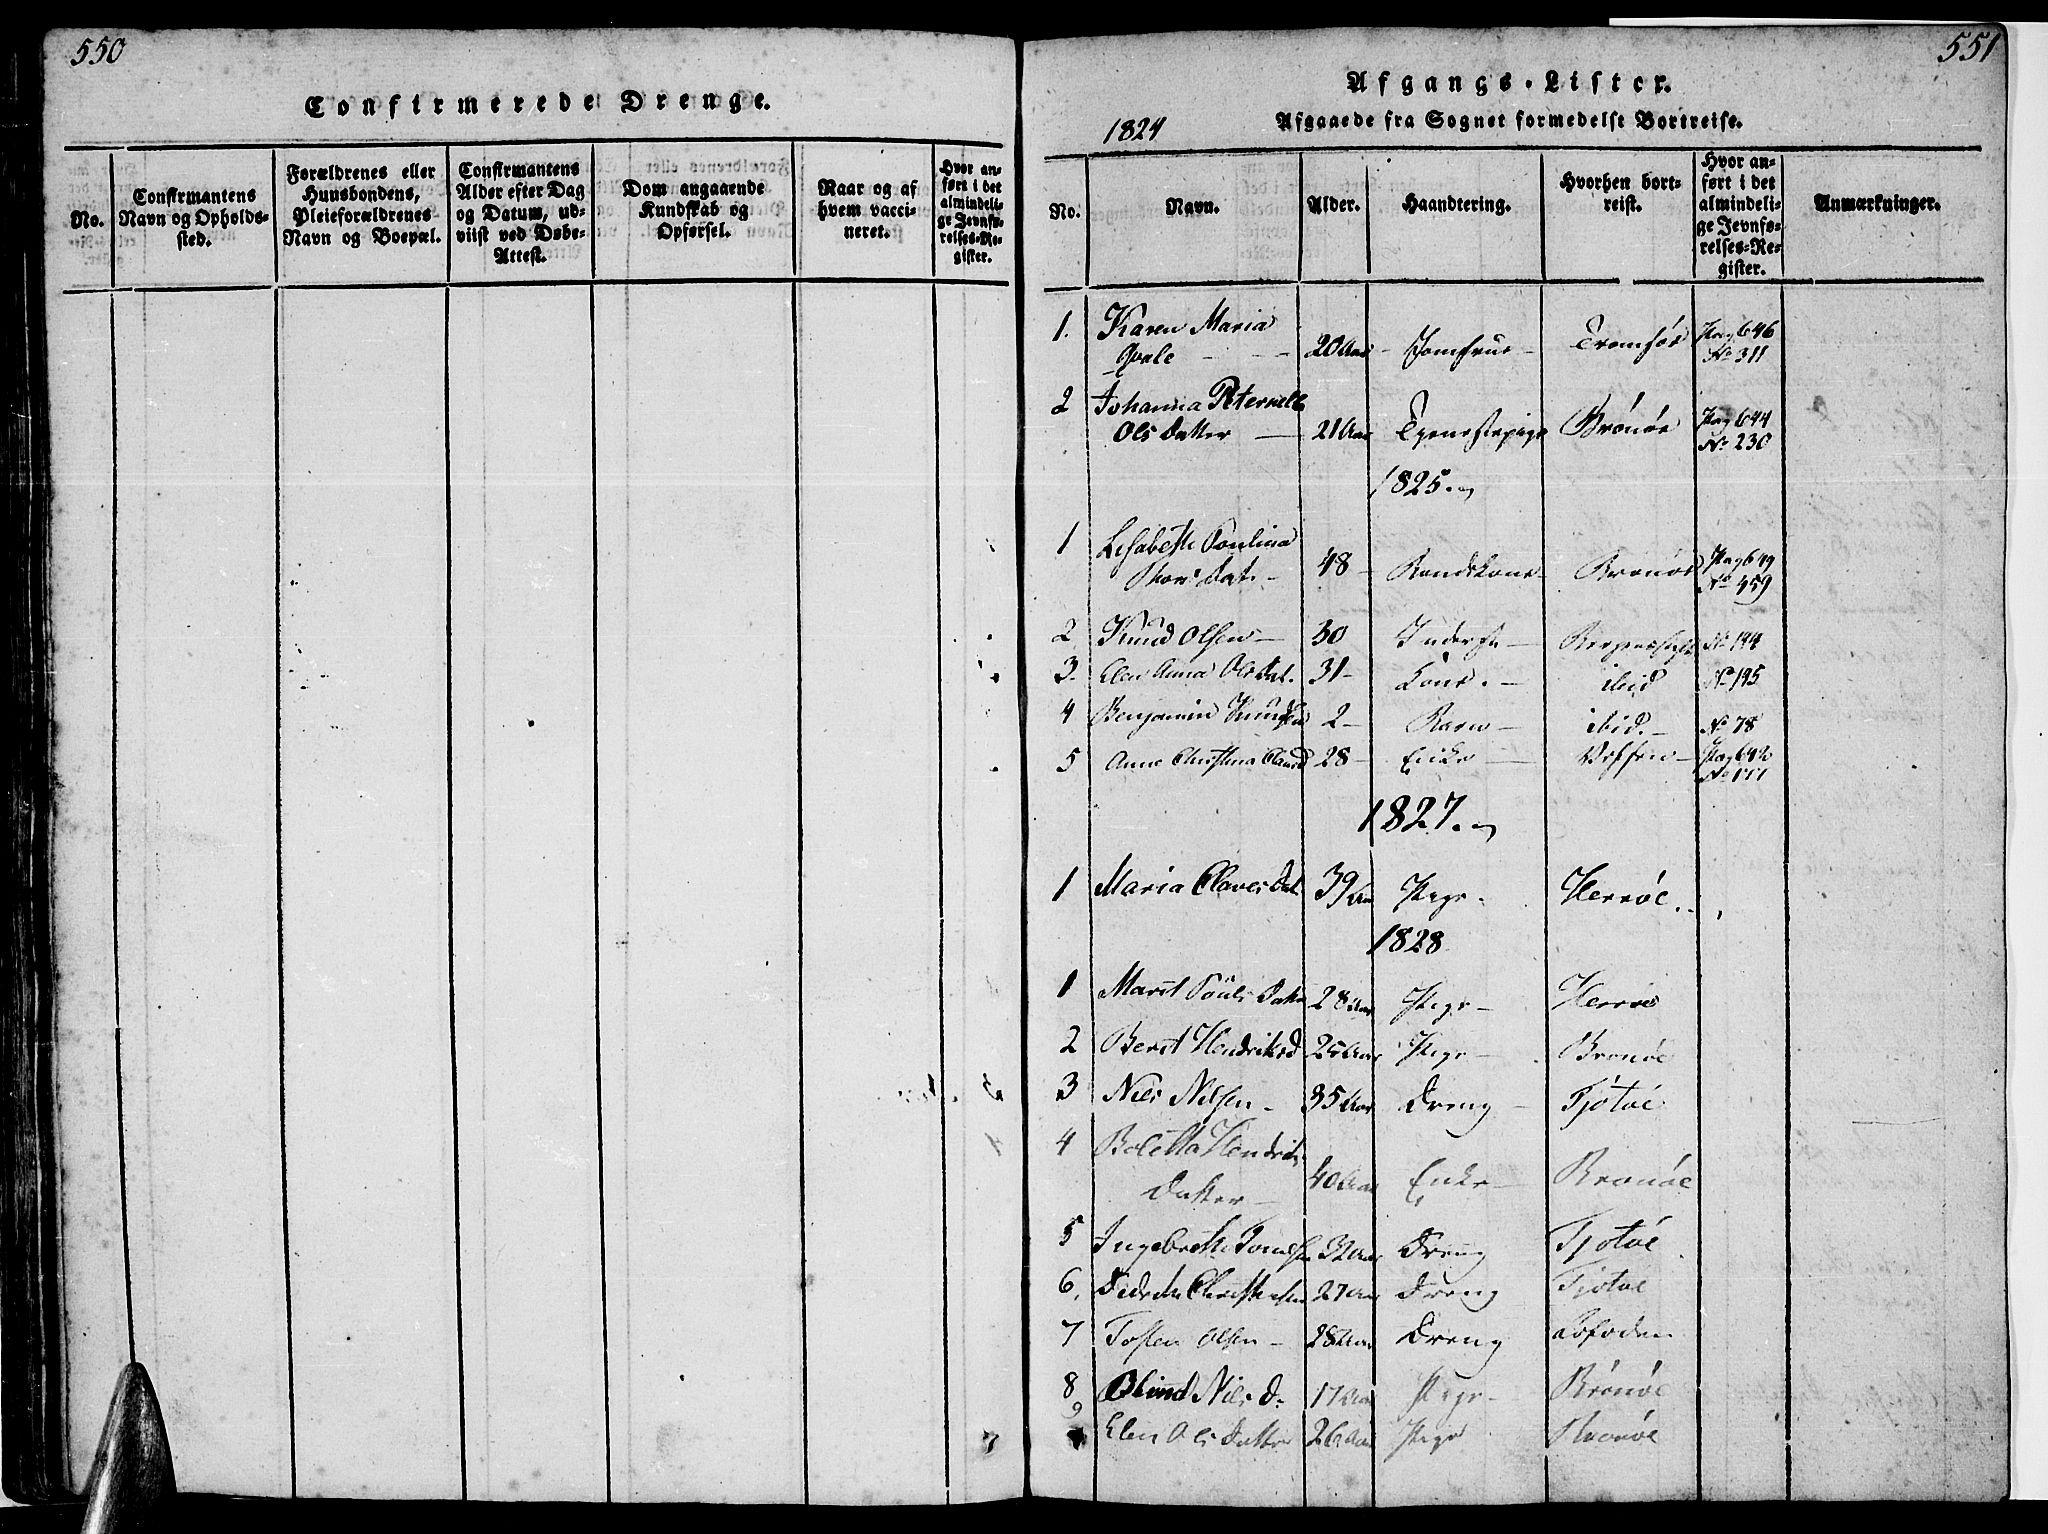 SAT, Ministerialprotokoller, klokkerbøker og fødselsregistre - Nordland, 816/L0239: Ministerialbok nr. 816A05, 1820-1845, s. 550-551